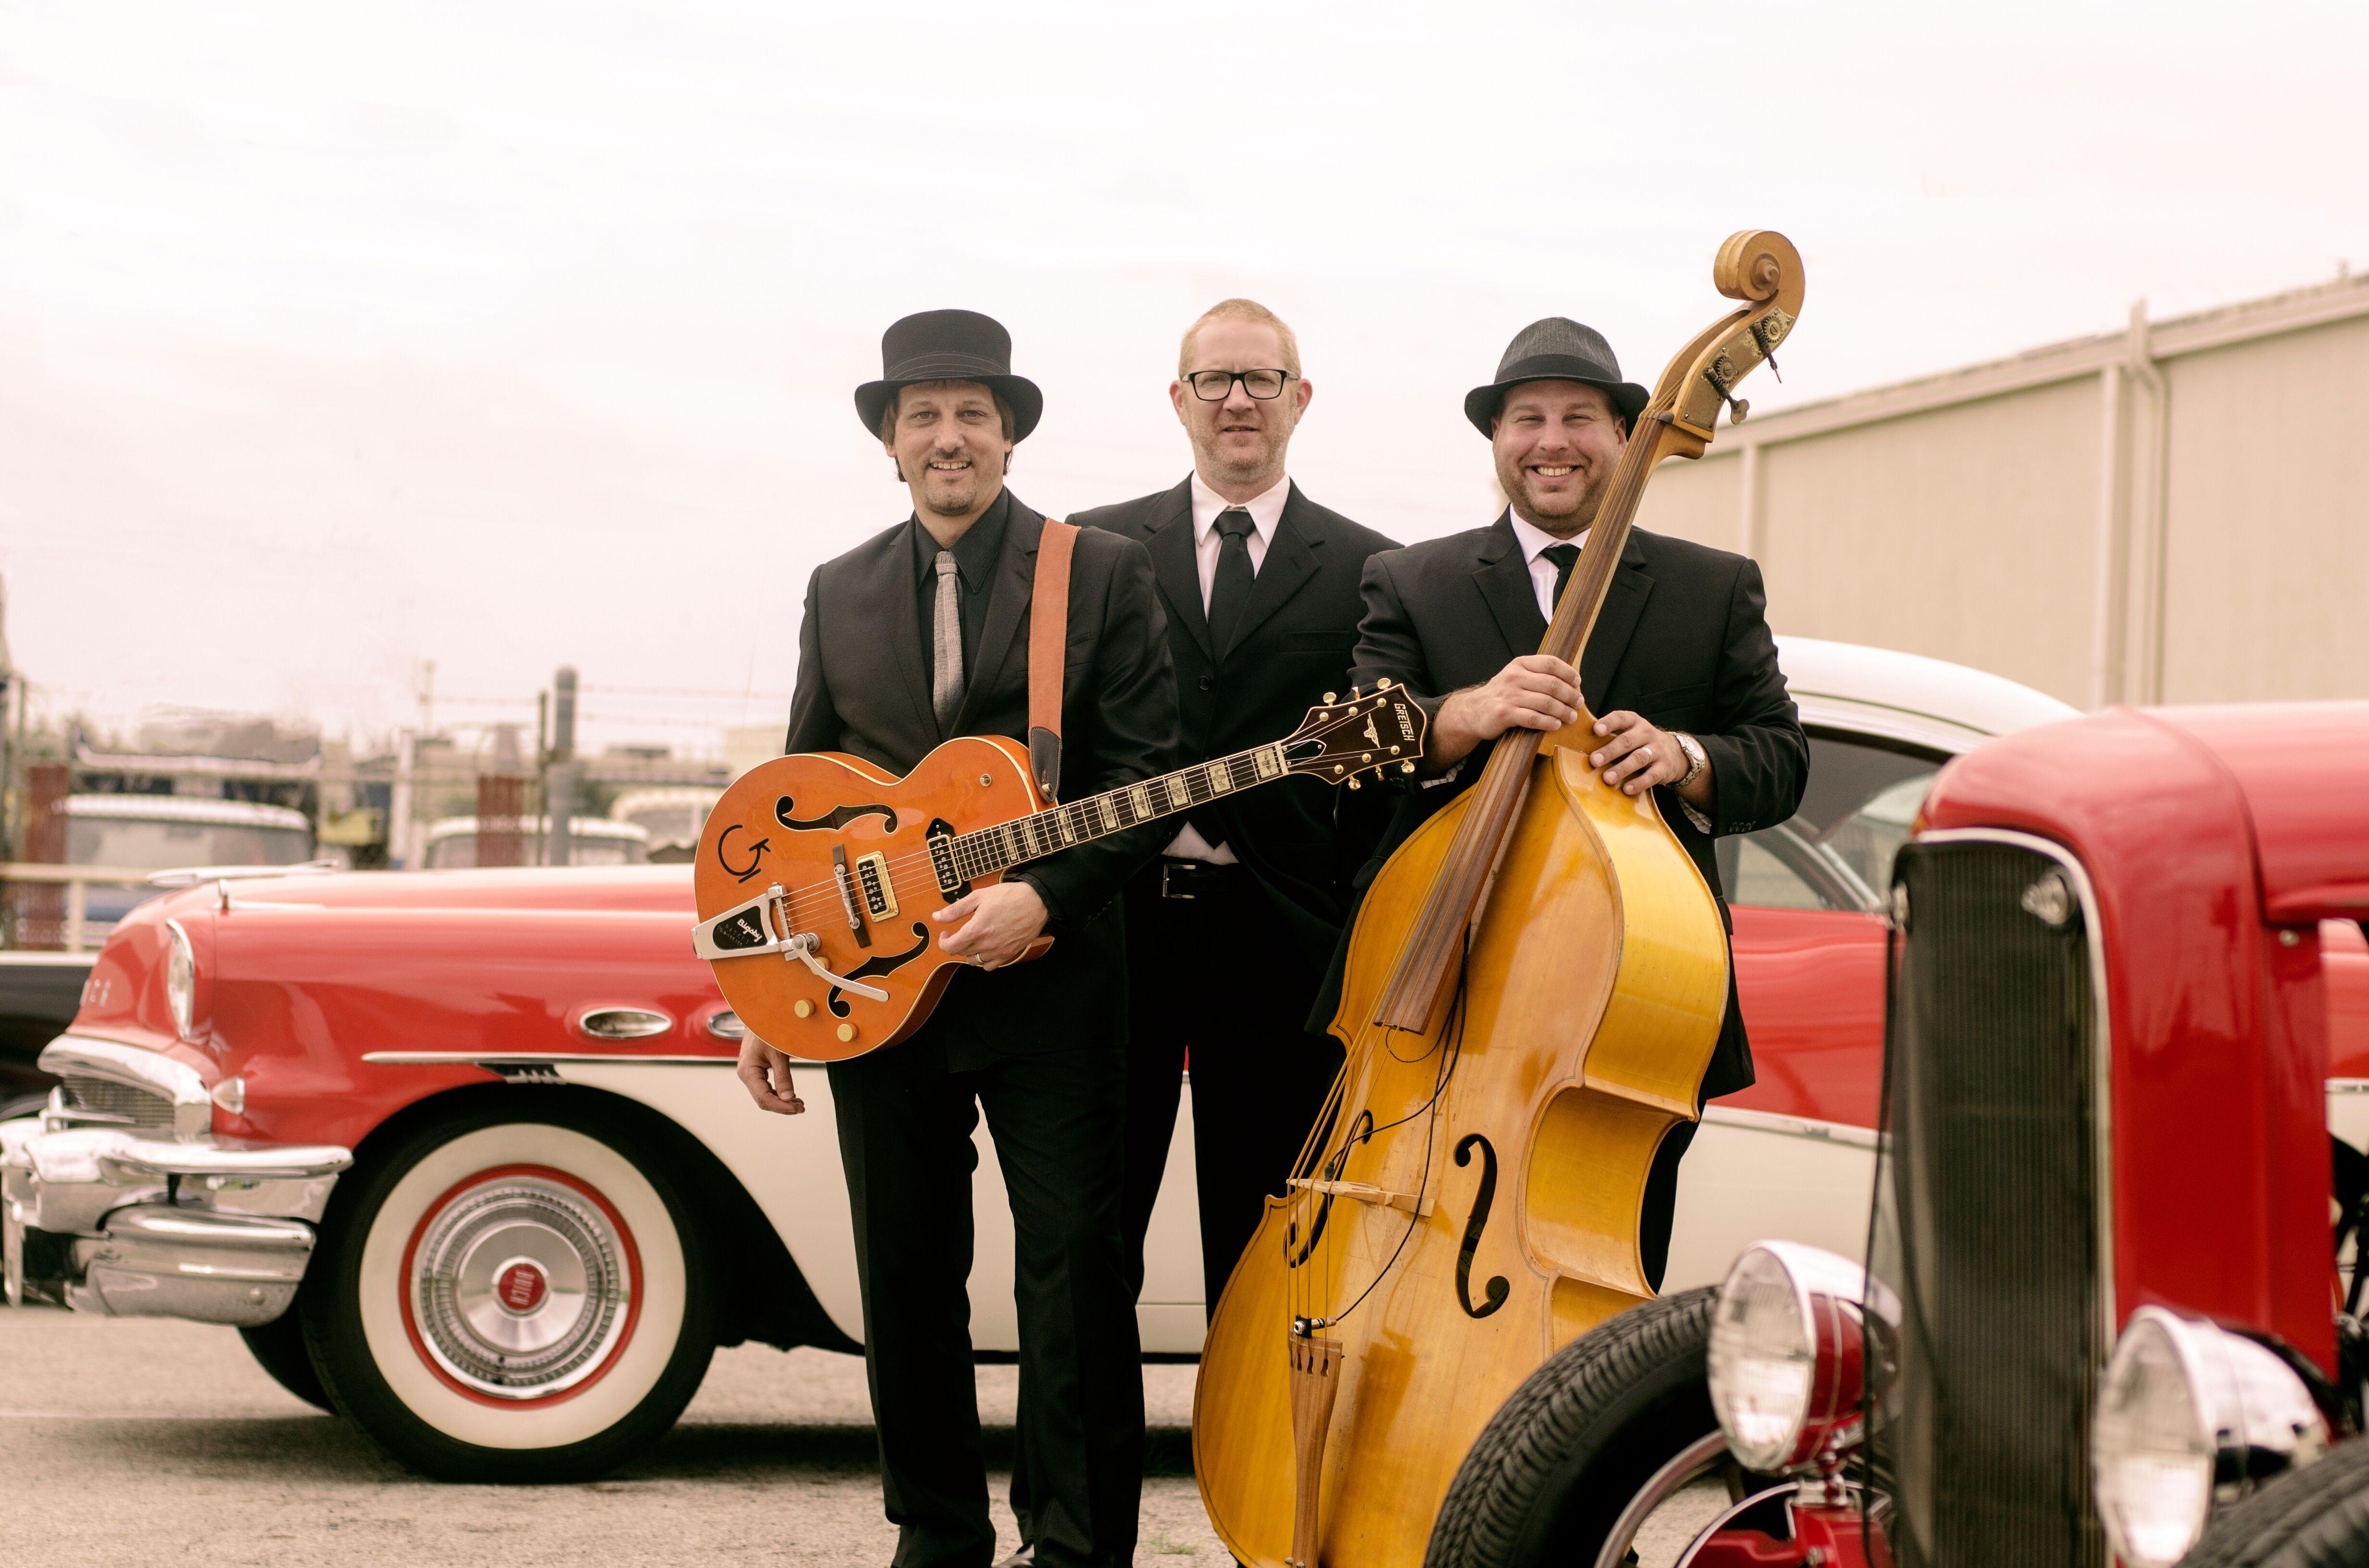 The Vinyl Stripes - Rockabilly Band - Dallas, TX